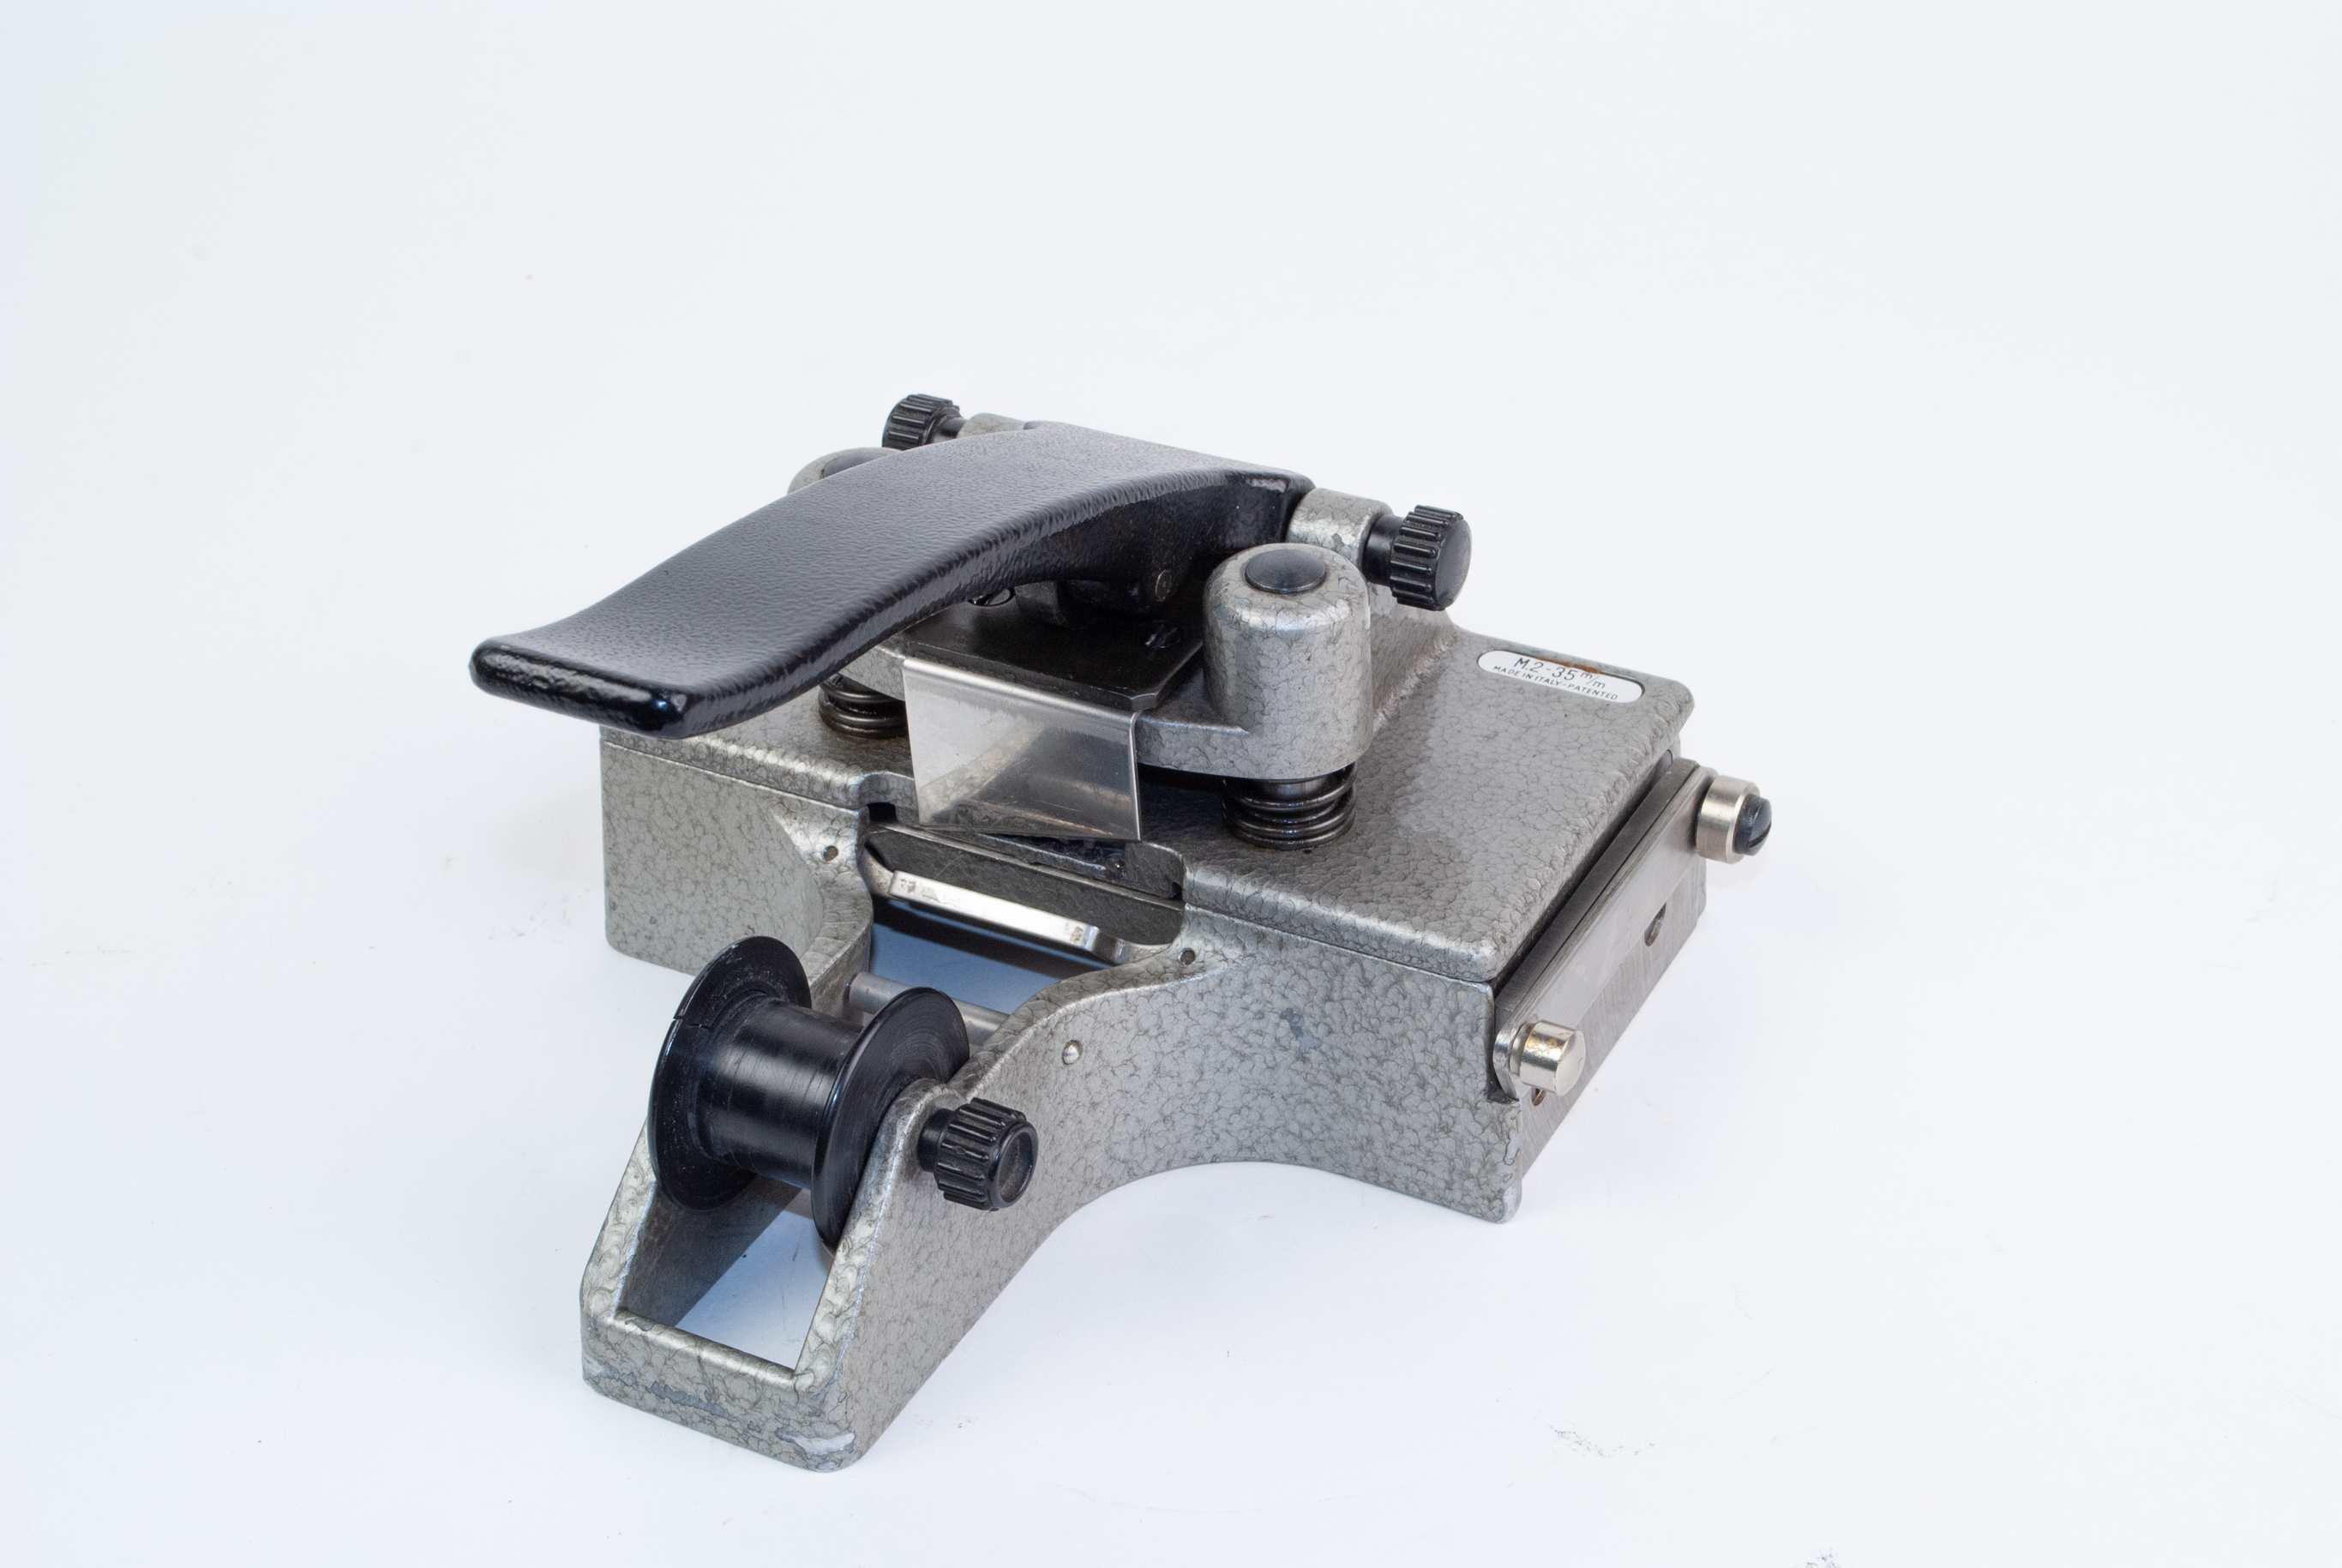 CIR 35mm - M2 (used)